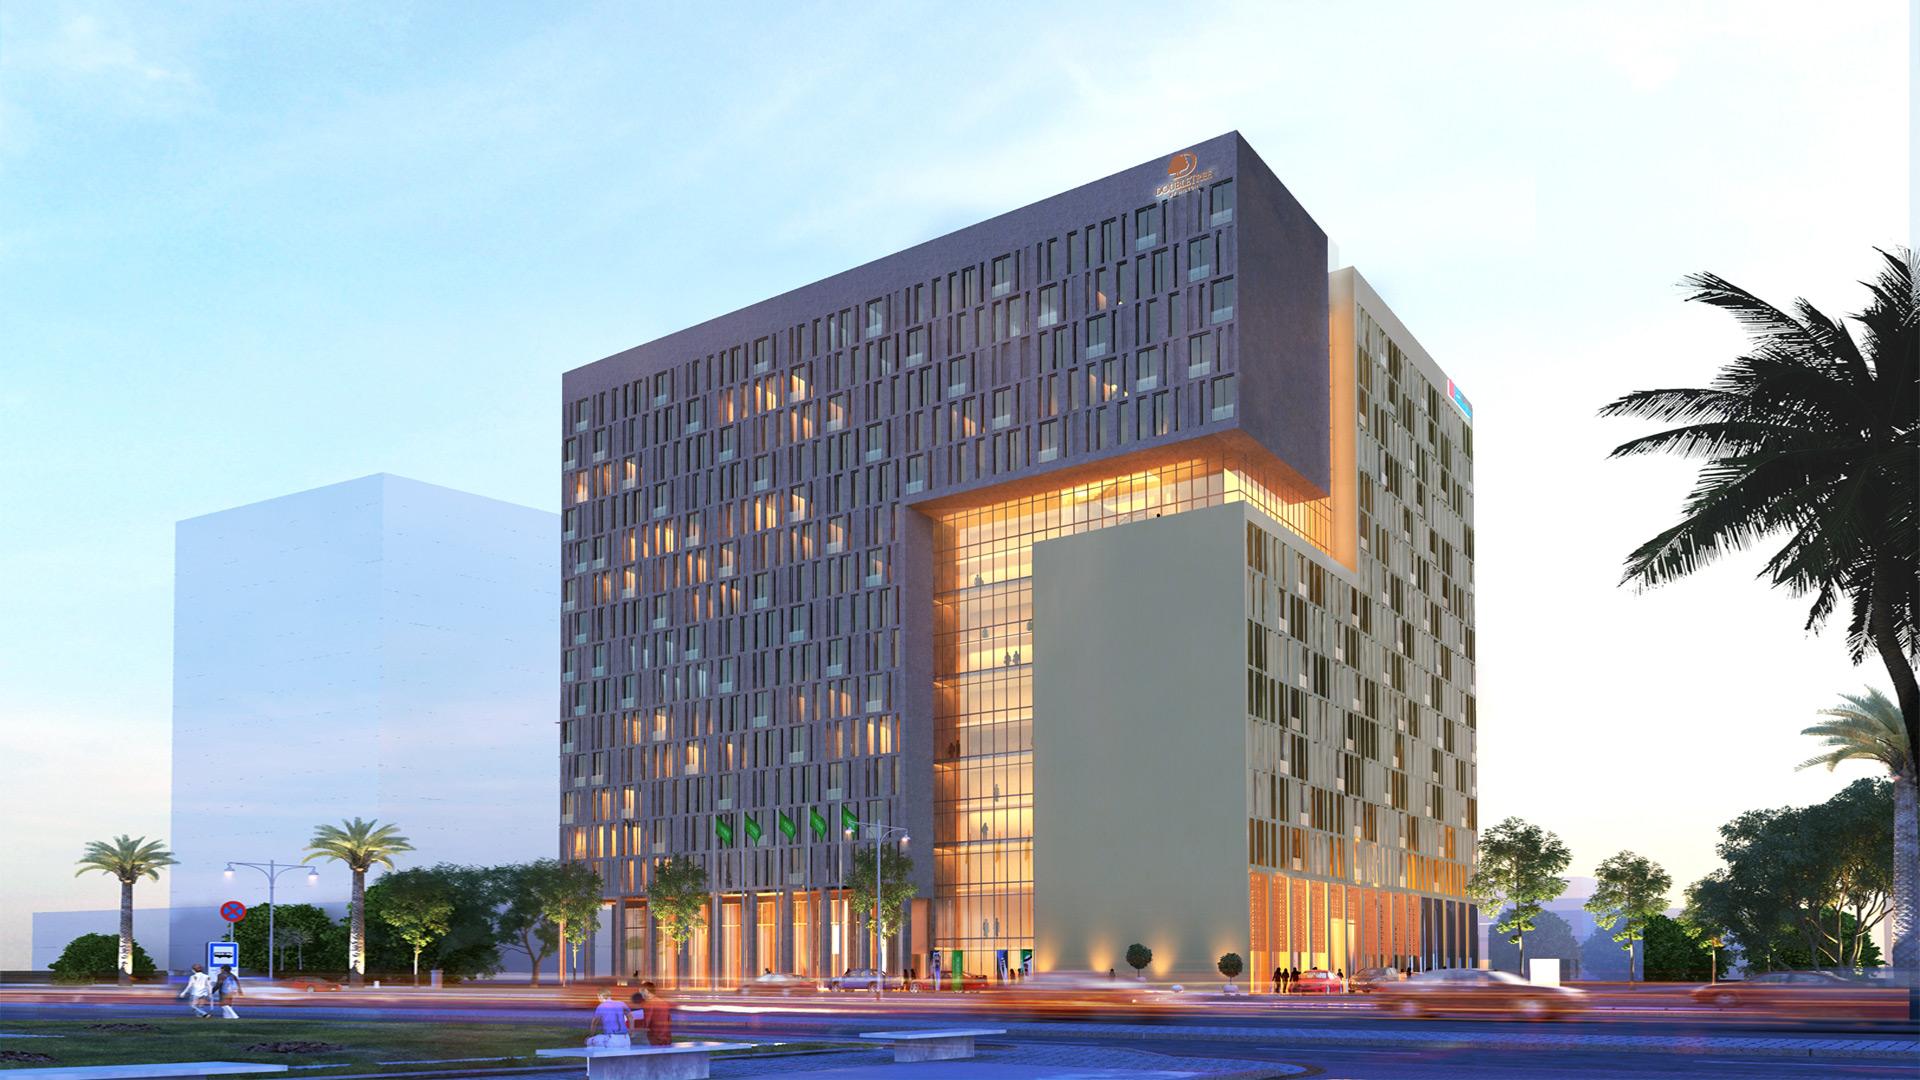 Hilton Garden Inn Hotel Project - Riyadh1